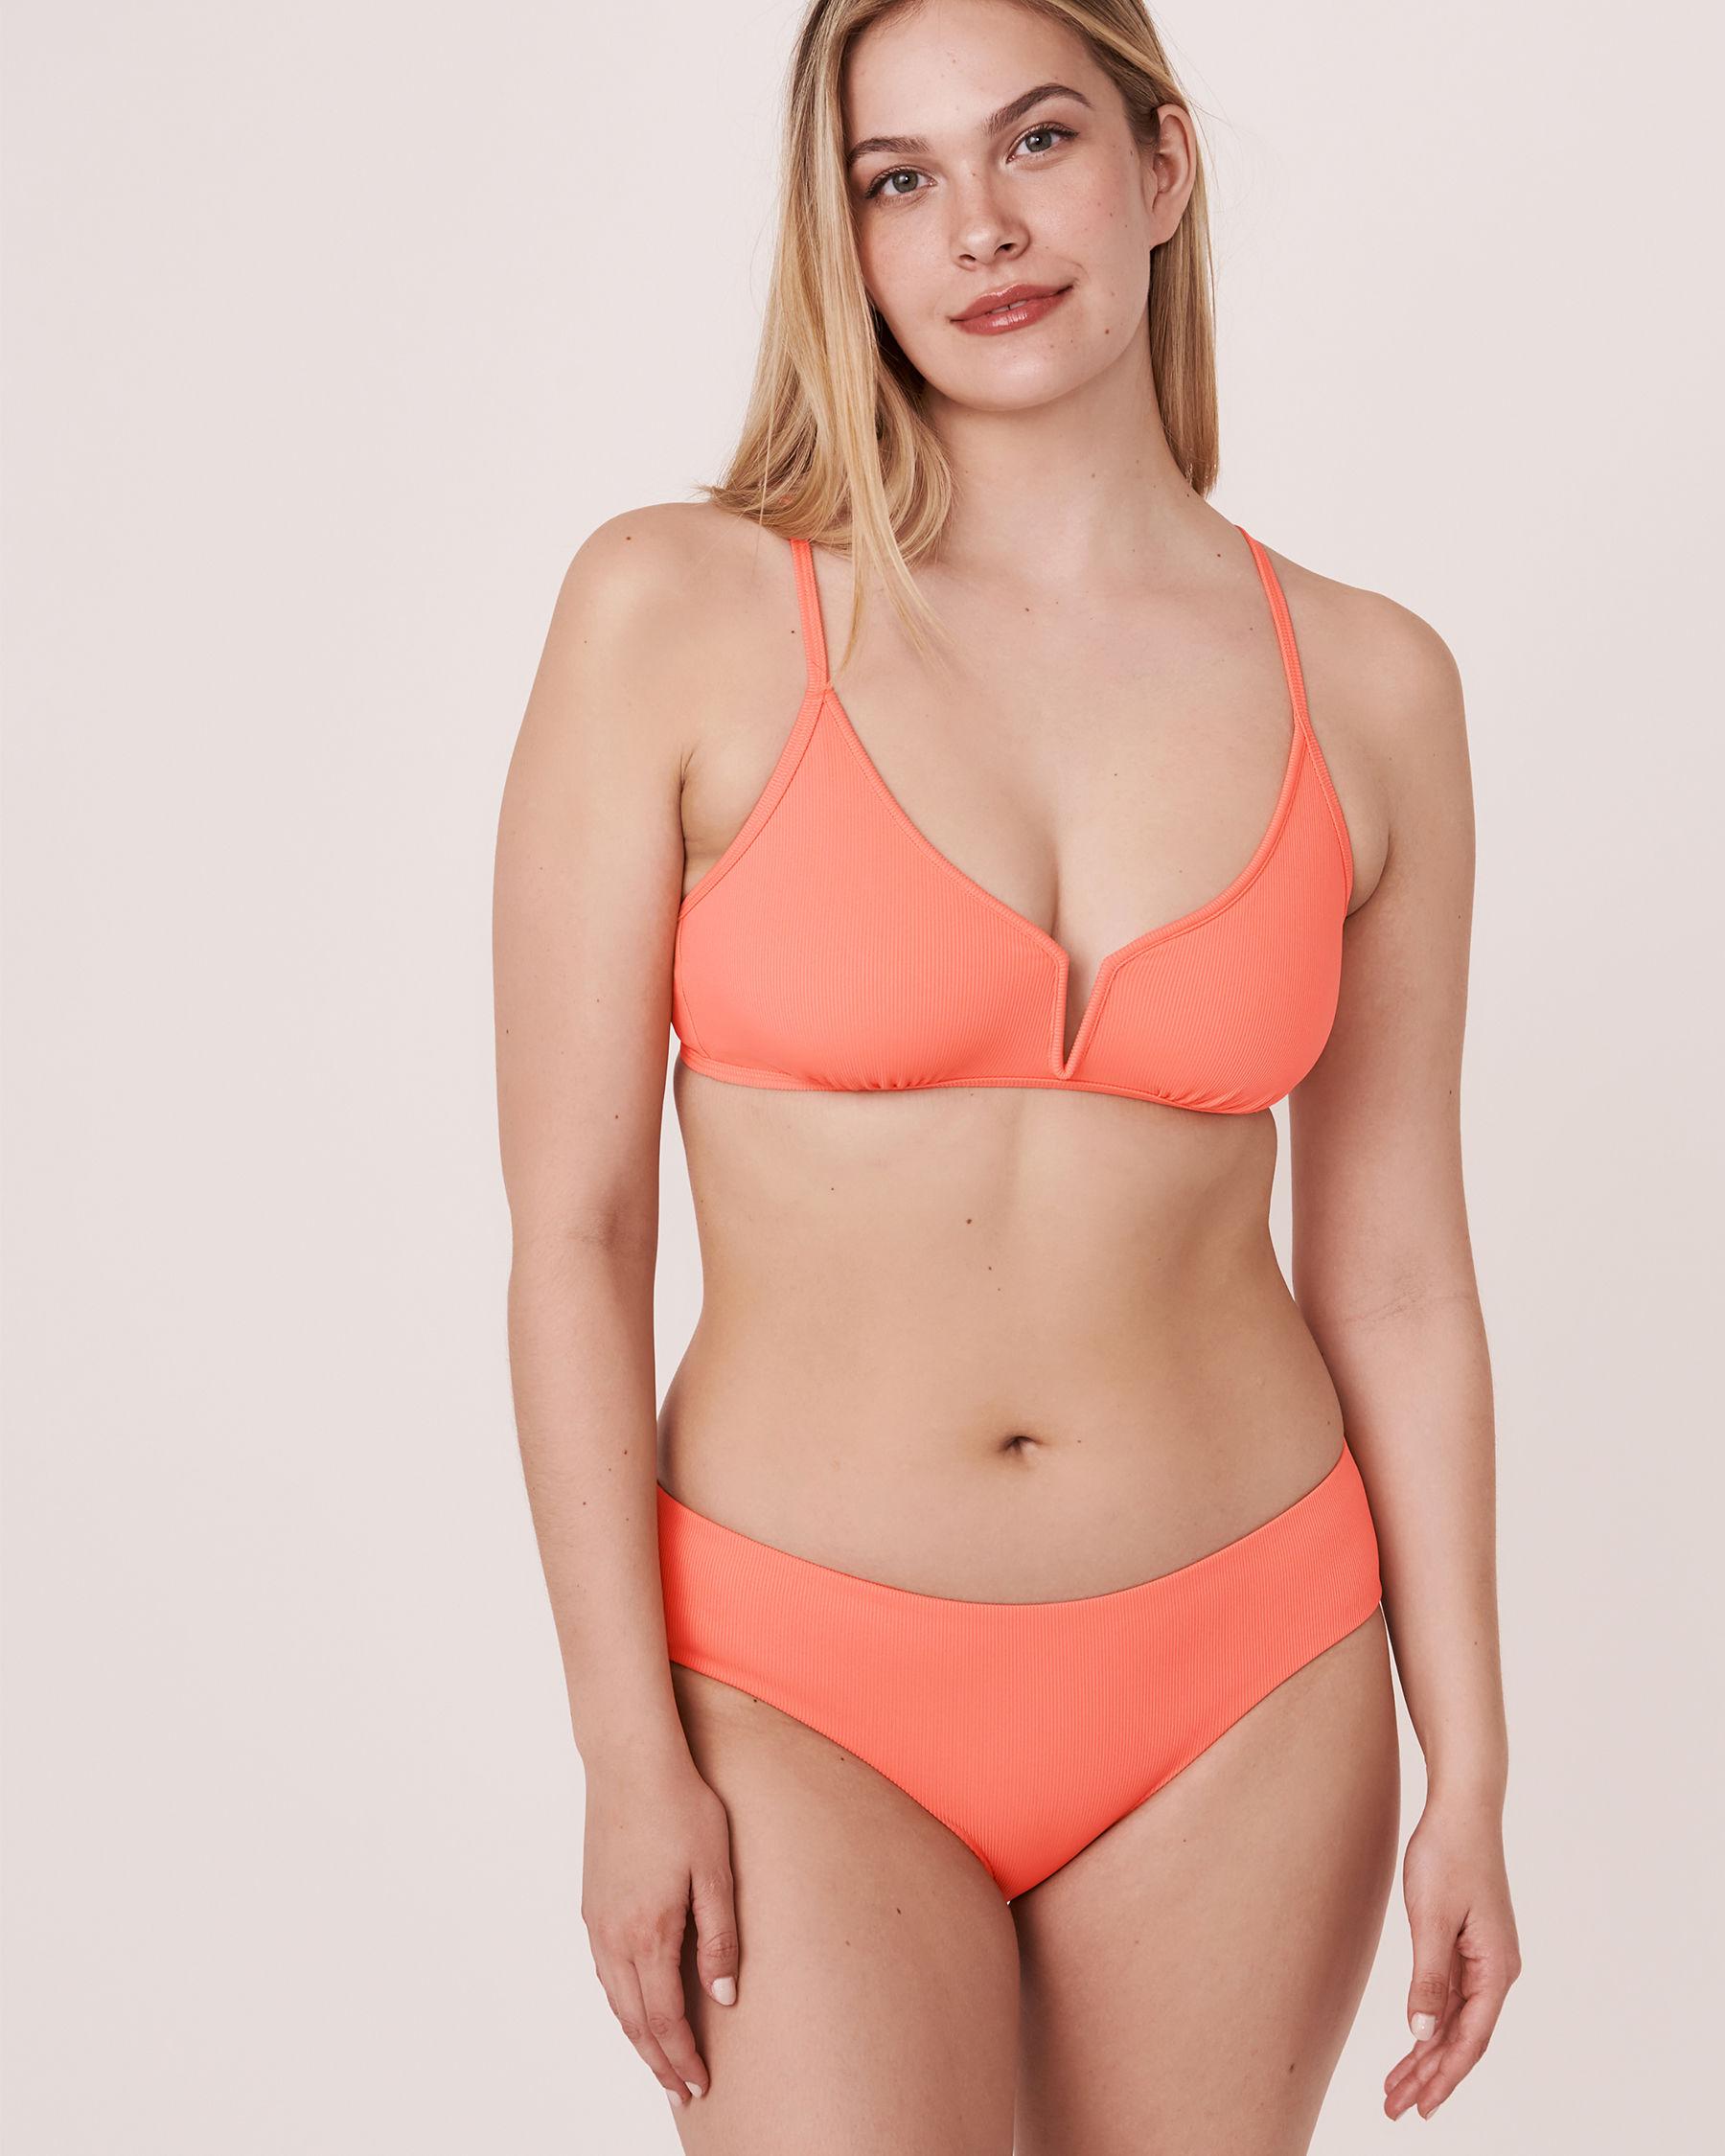 AQUAROSE Bas de bikini hipster en fibres recyclées SOLID RIB Corail 70300051 - Voir3